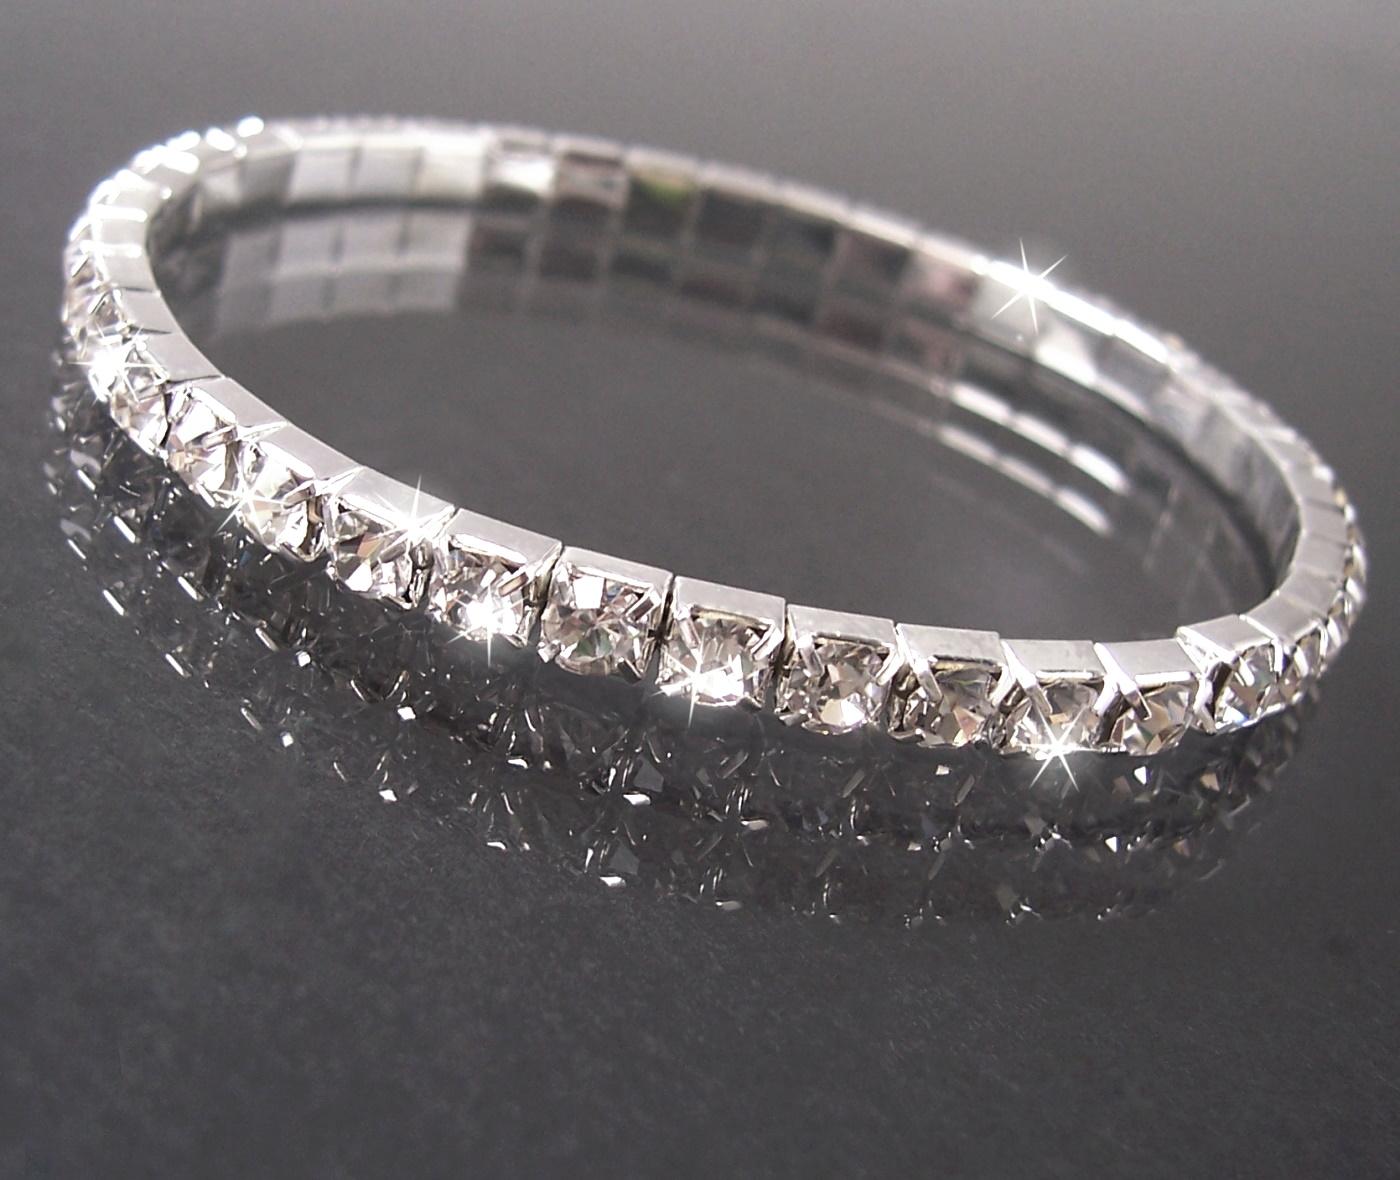 ARMBAND Silber pl STRASS 4mm Damen dehnbar festlich A1116